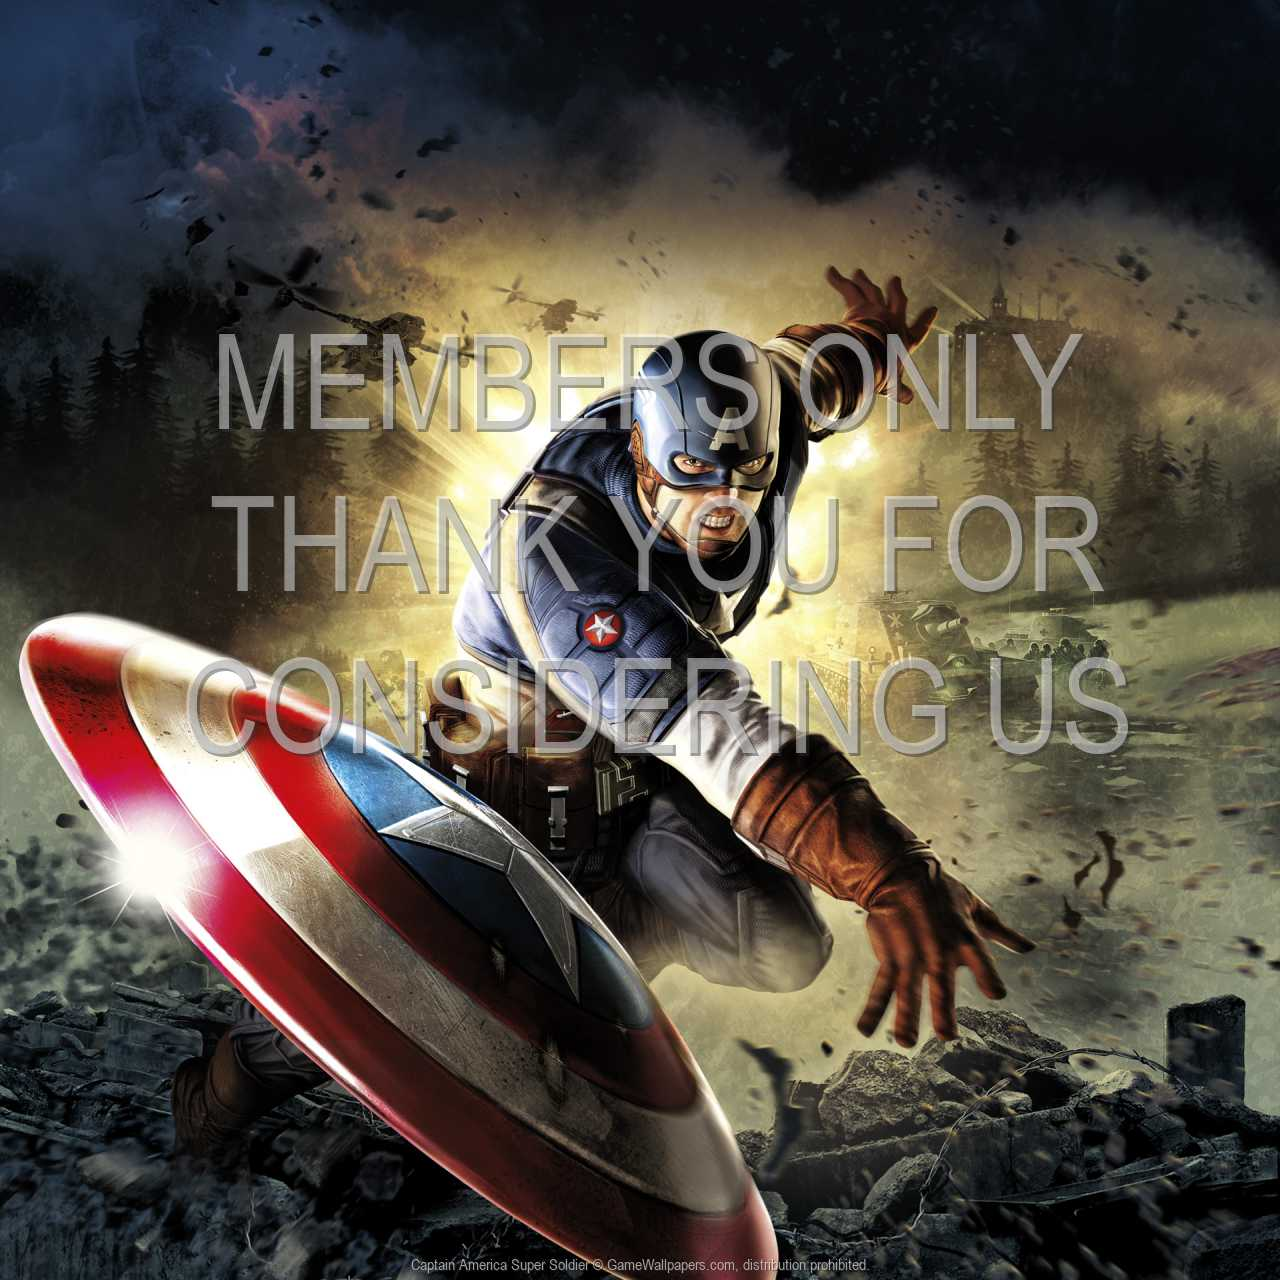 Captain America: Super Soldier 720p Horizontal Móvil fondo de escritorio 01